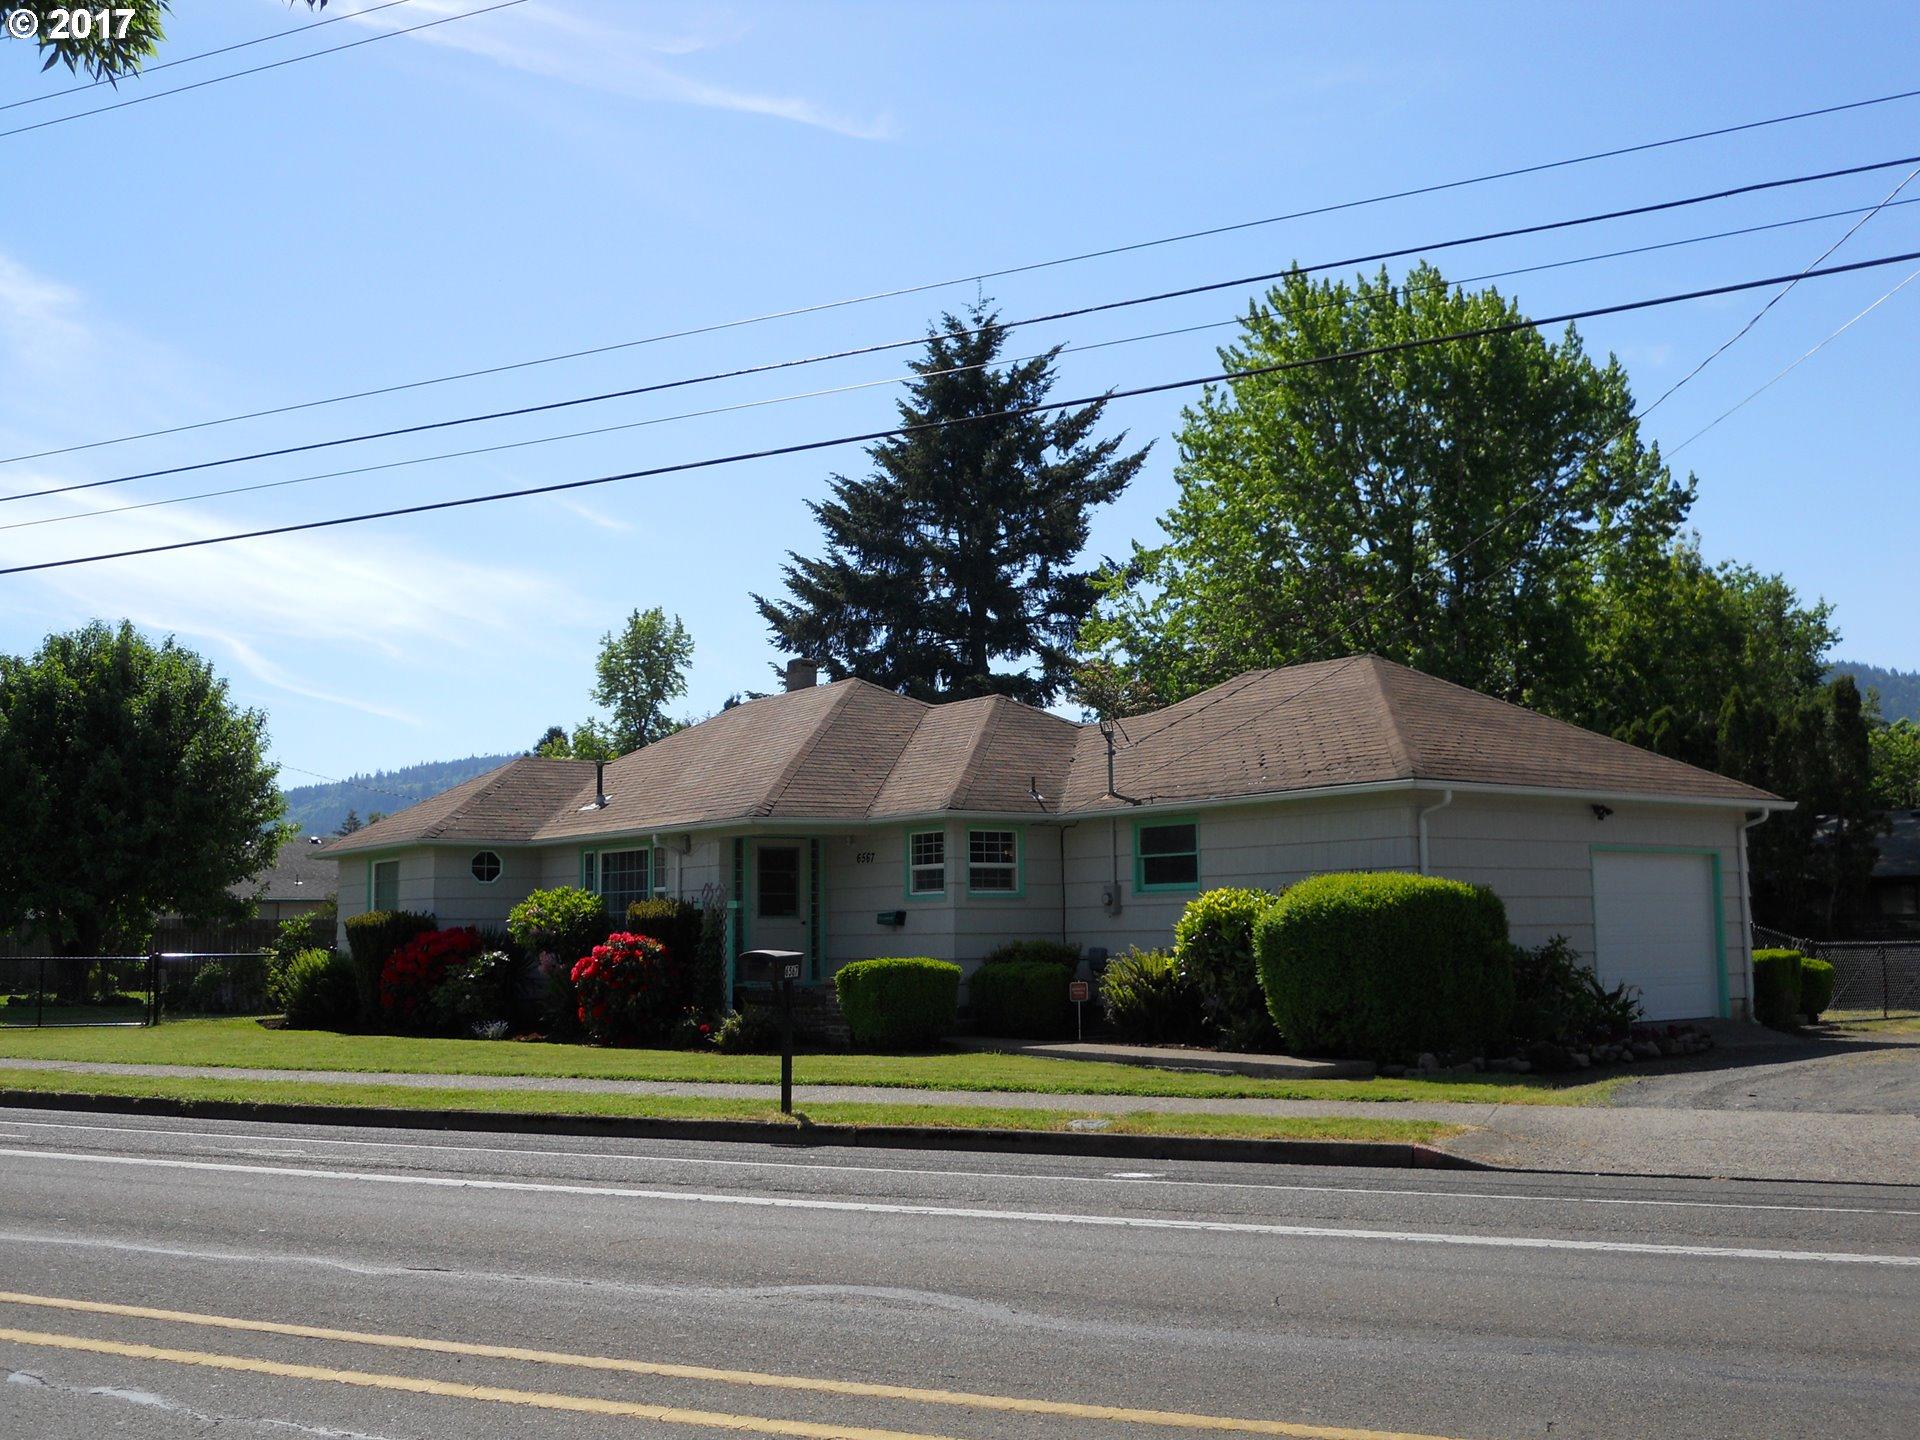 6567 THURSTON RD Springfield, OR 97478 - MLS #: 17562146